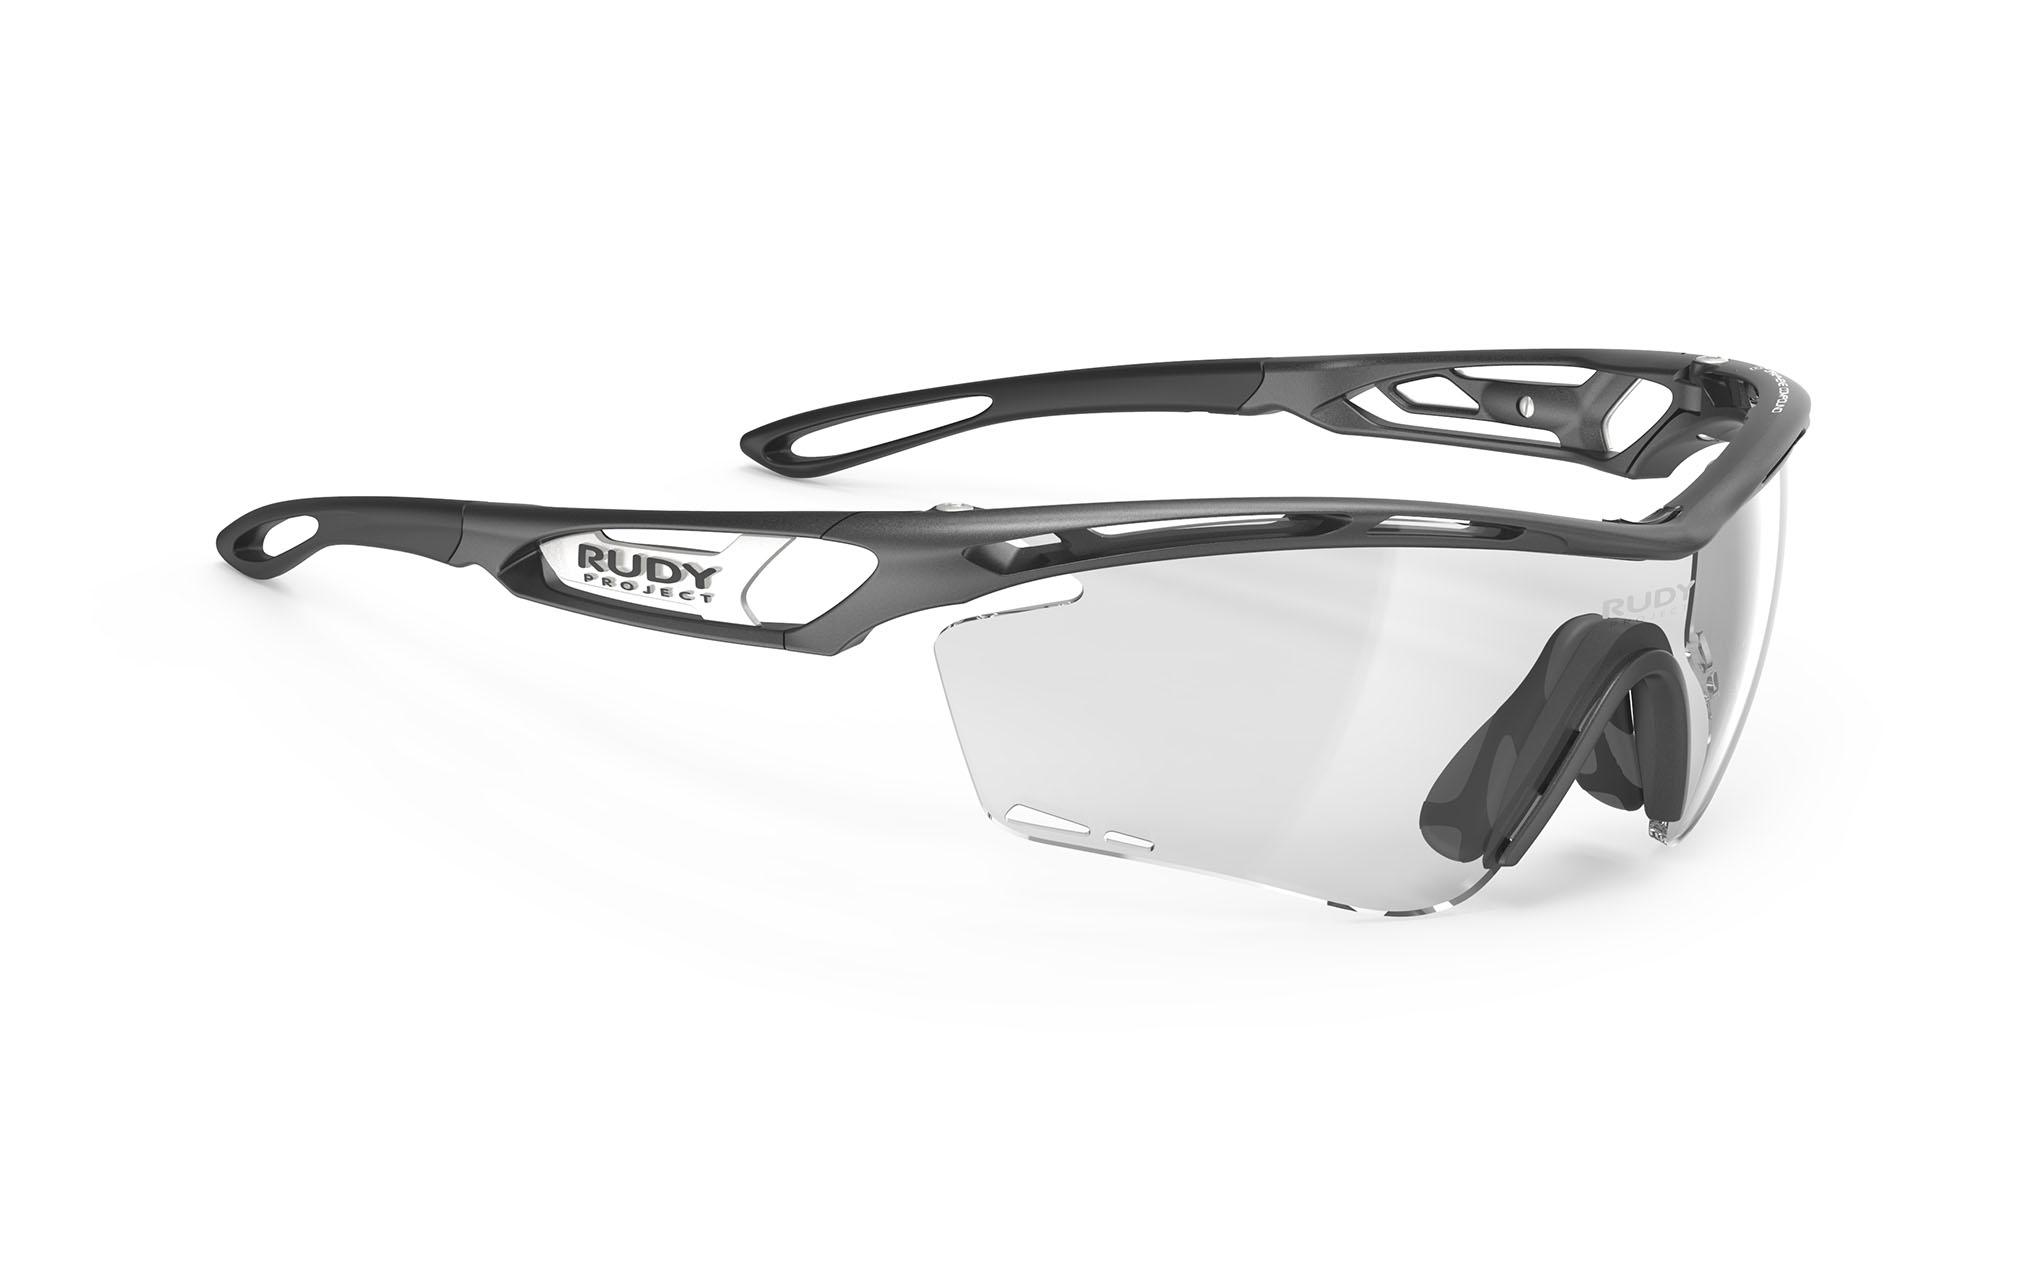 cfabbe5632 Performance Eyewear Tralyx Graphene - Rudy Project